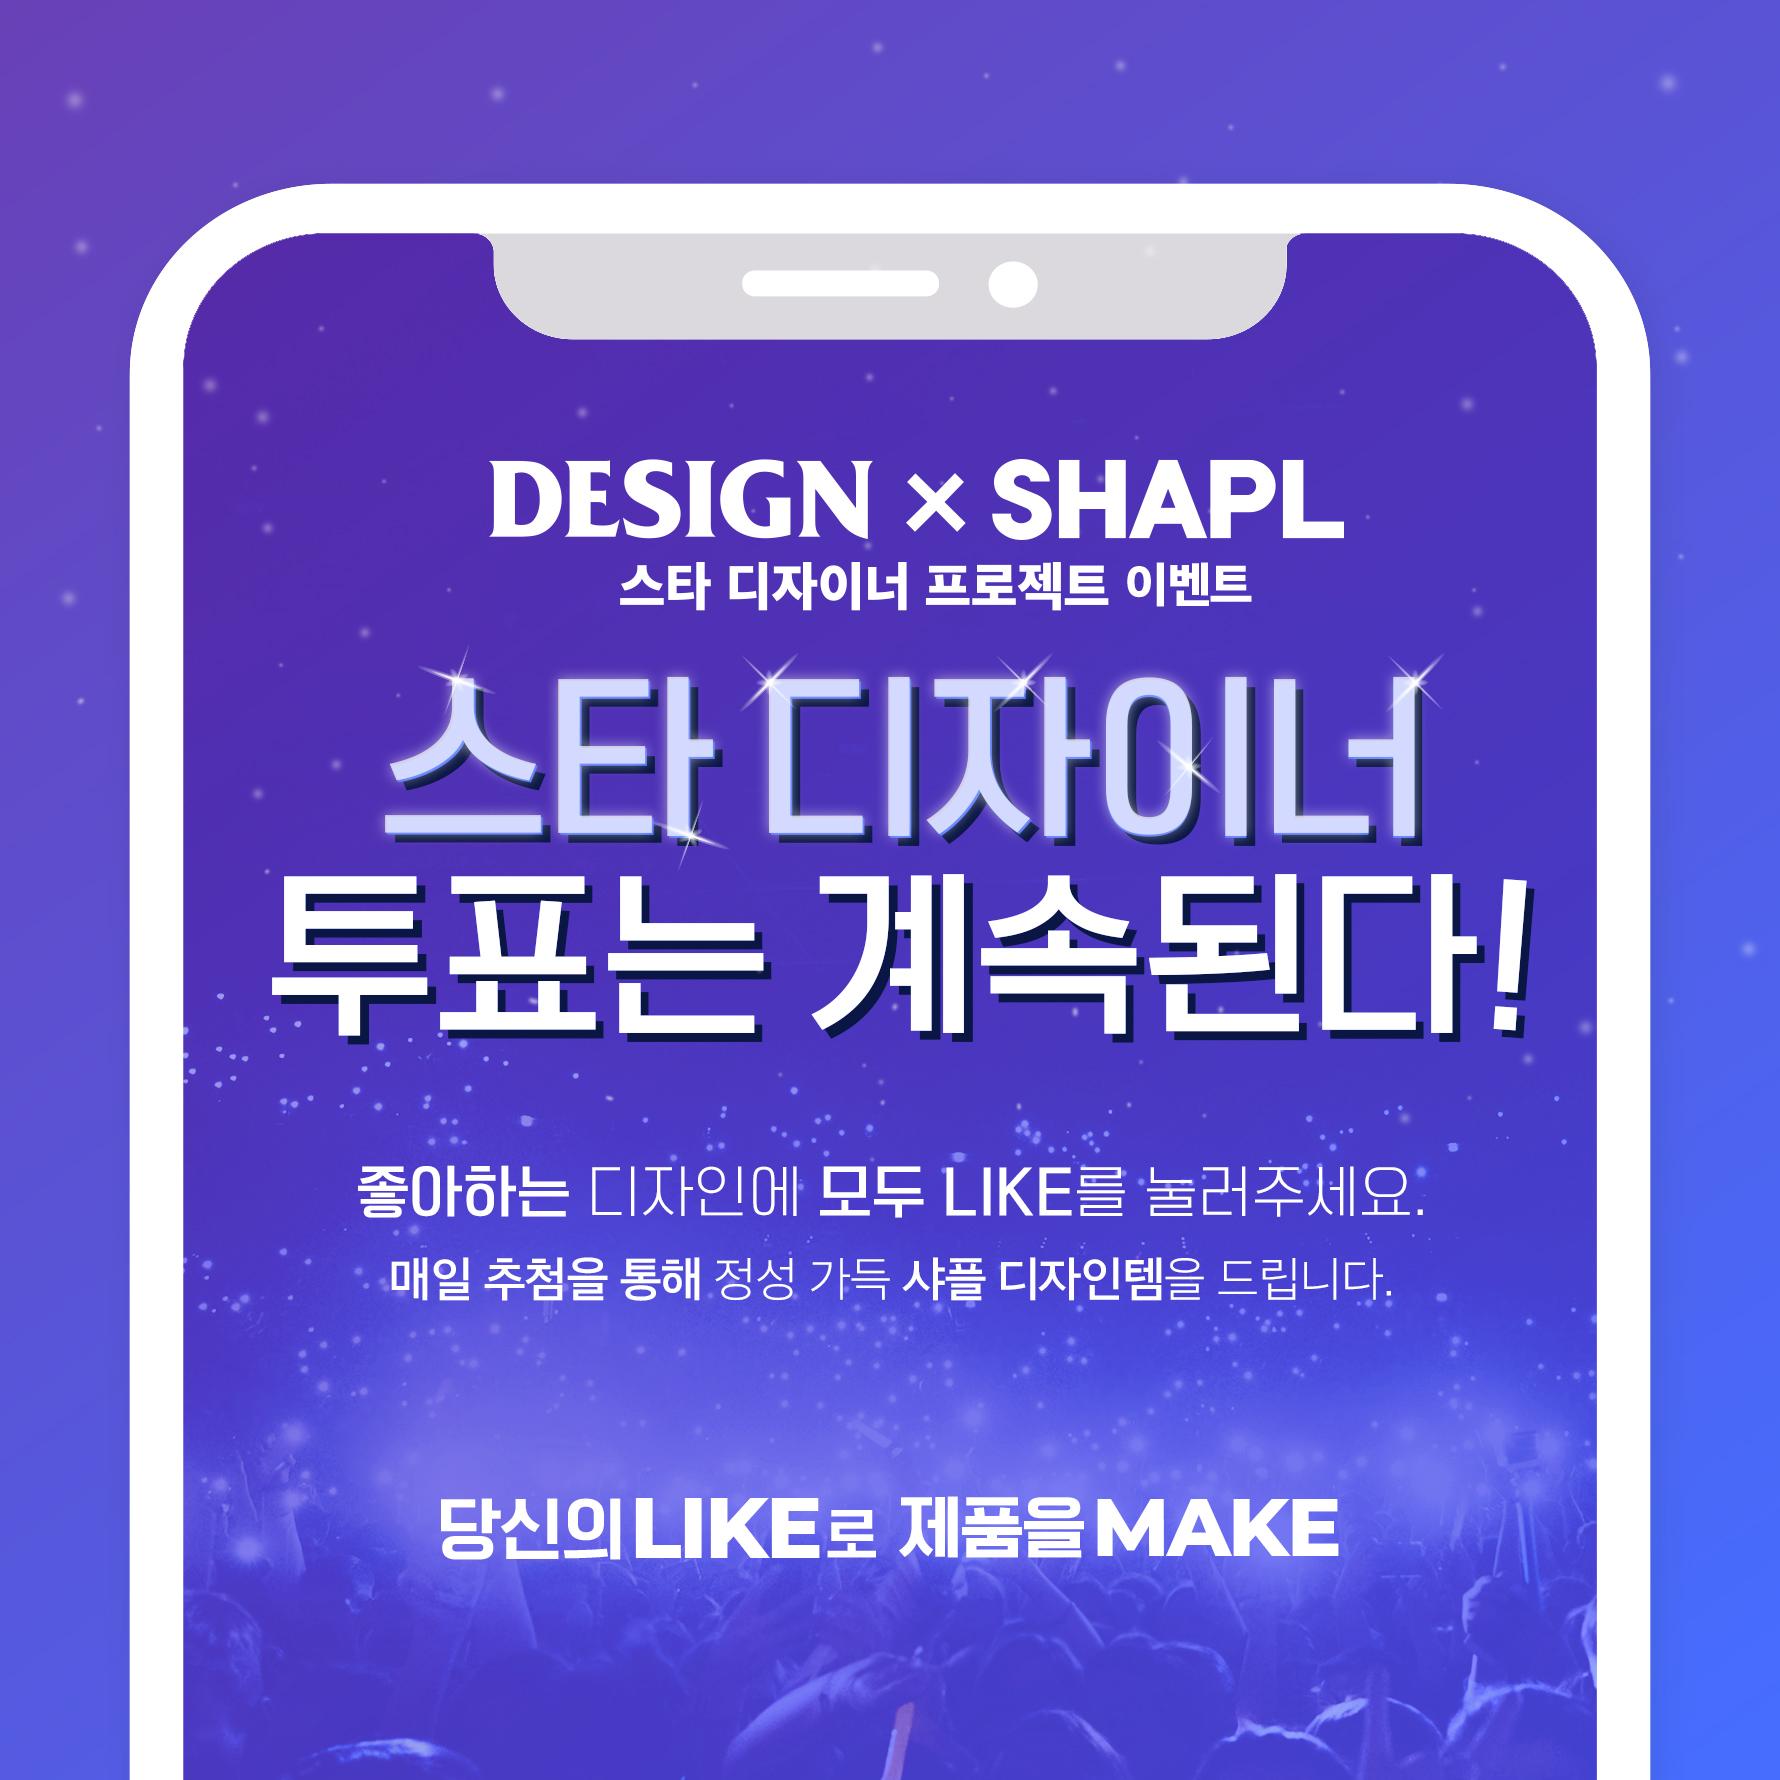 201812/SDF_SHAPL_Stardesign_Voting_181227_최종.jpg